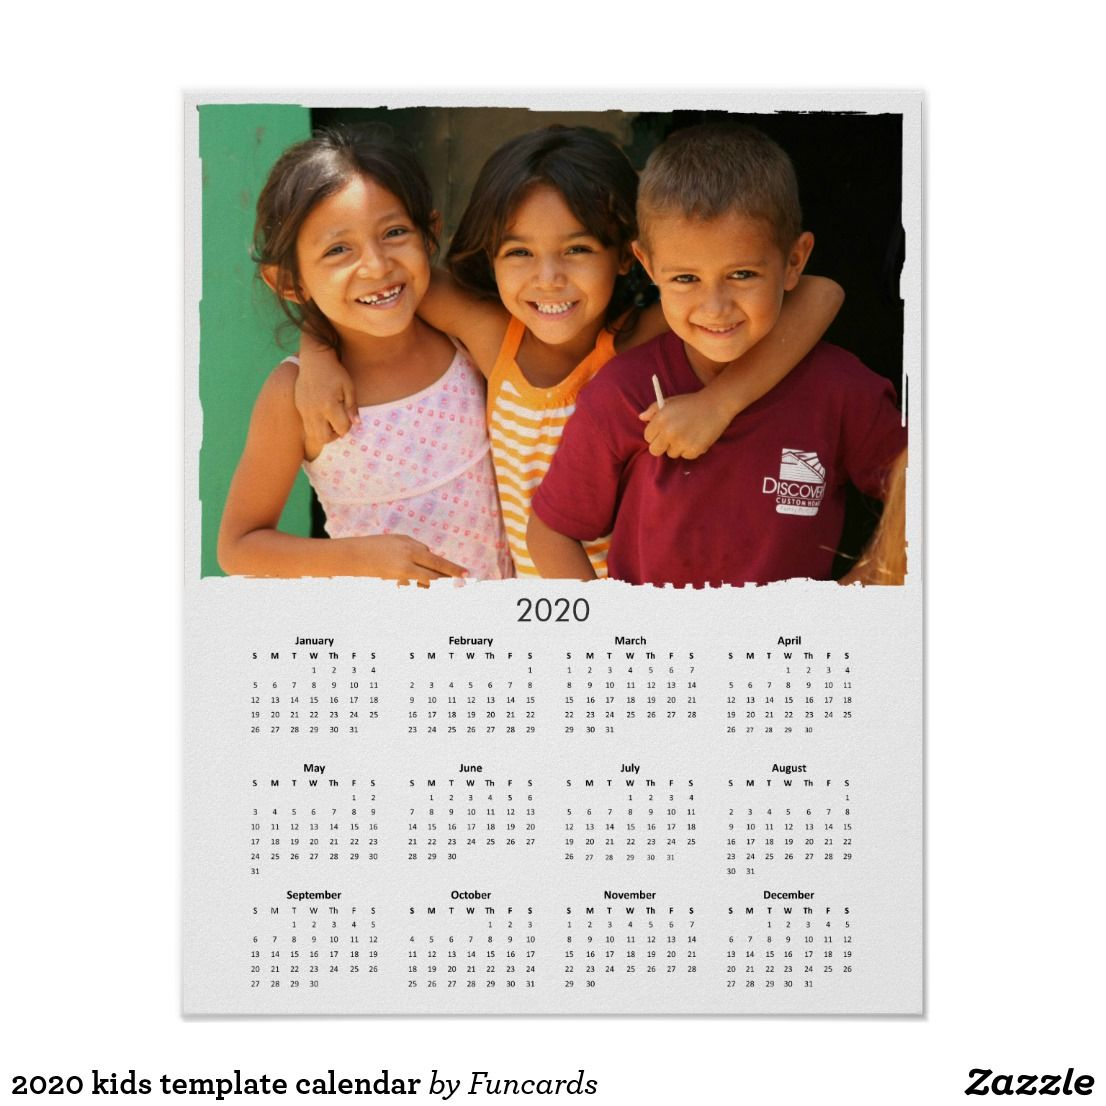 2020 kids template calendar poster | Zazzle.com